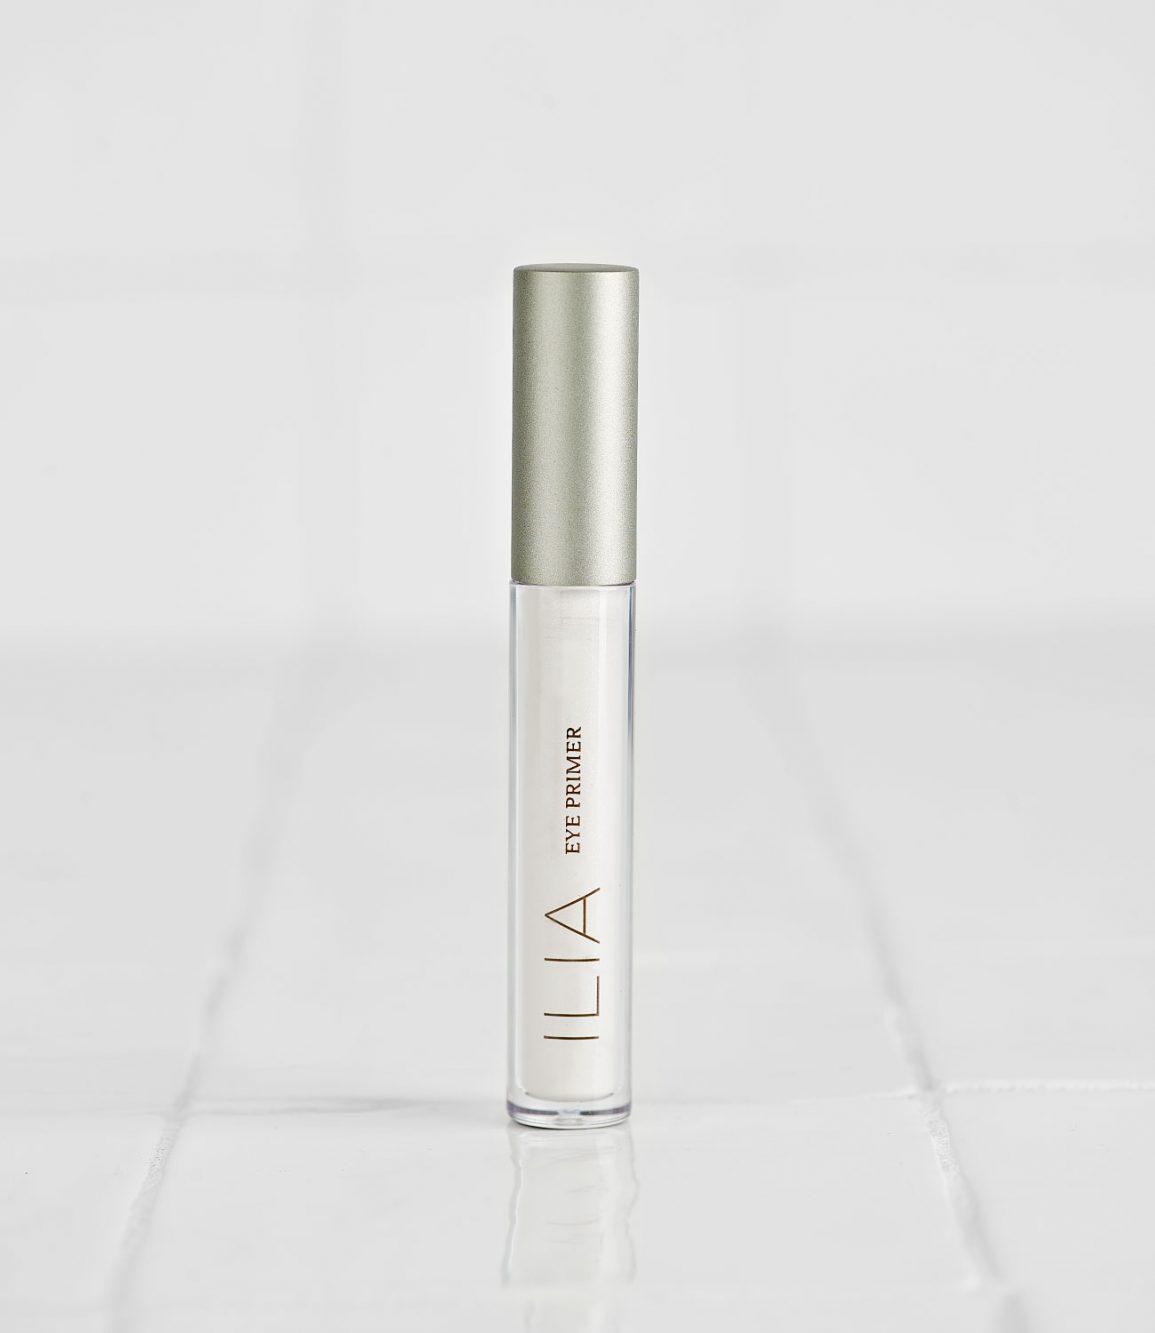 Base paupières Ilia - maquillage naturel